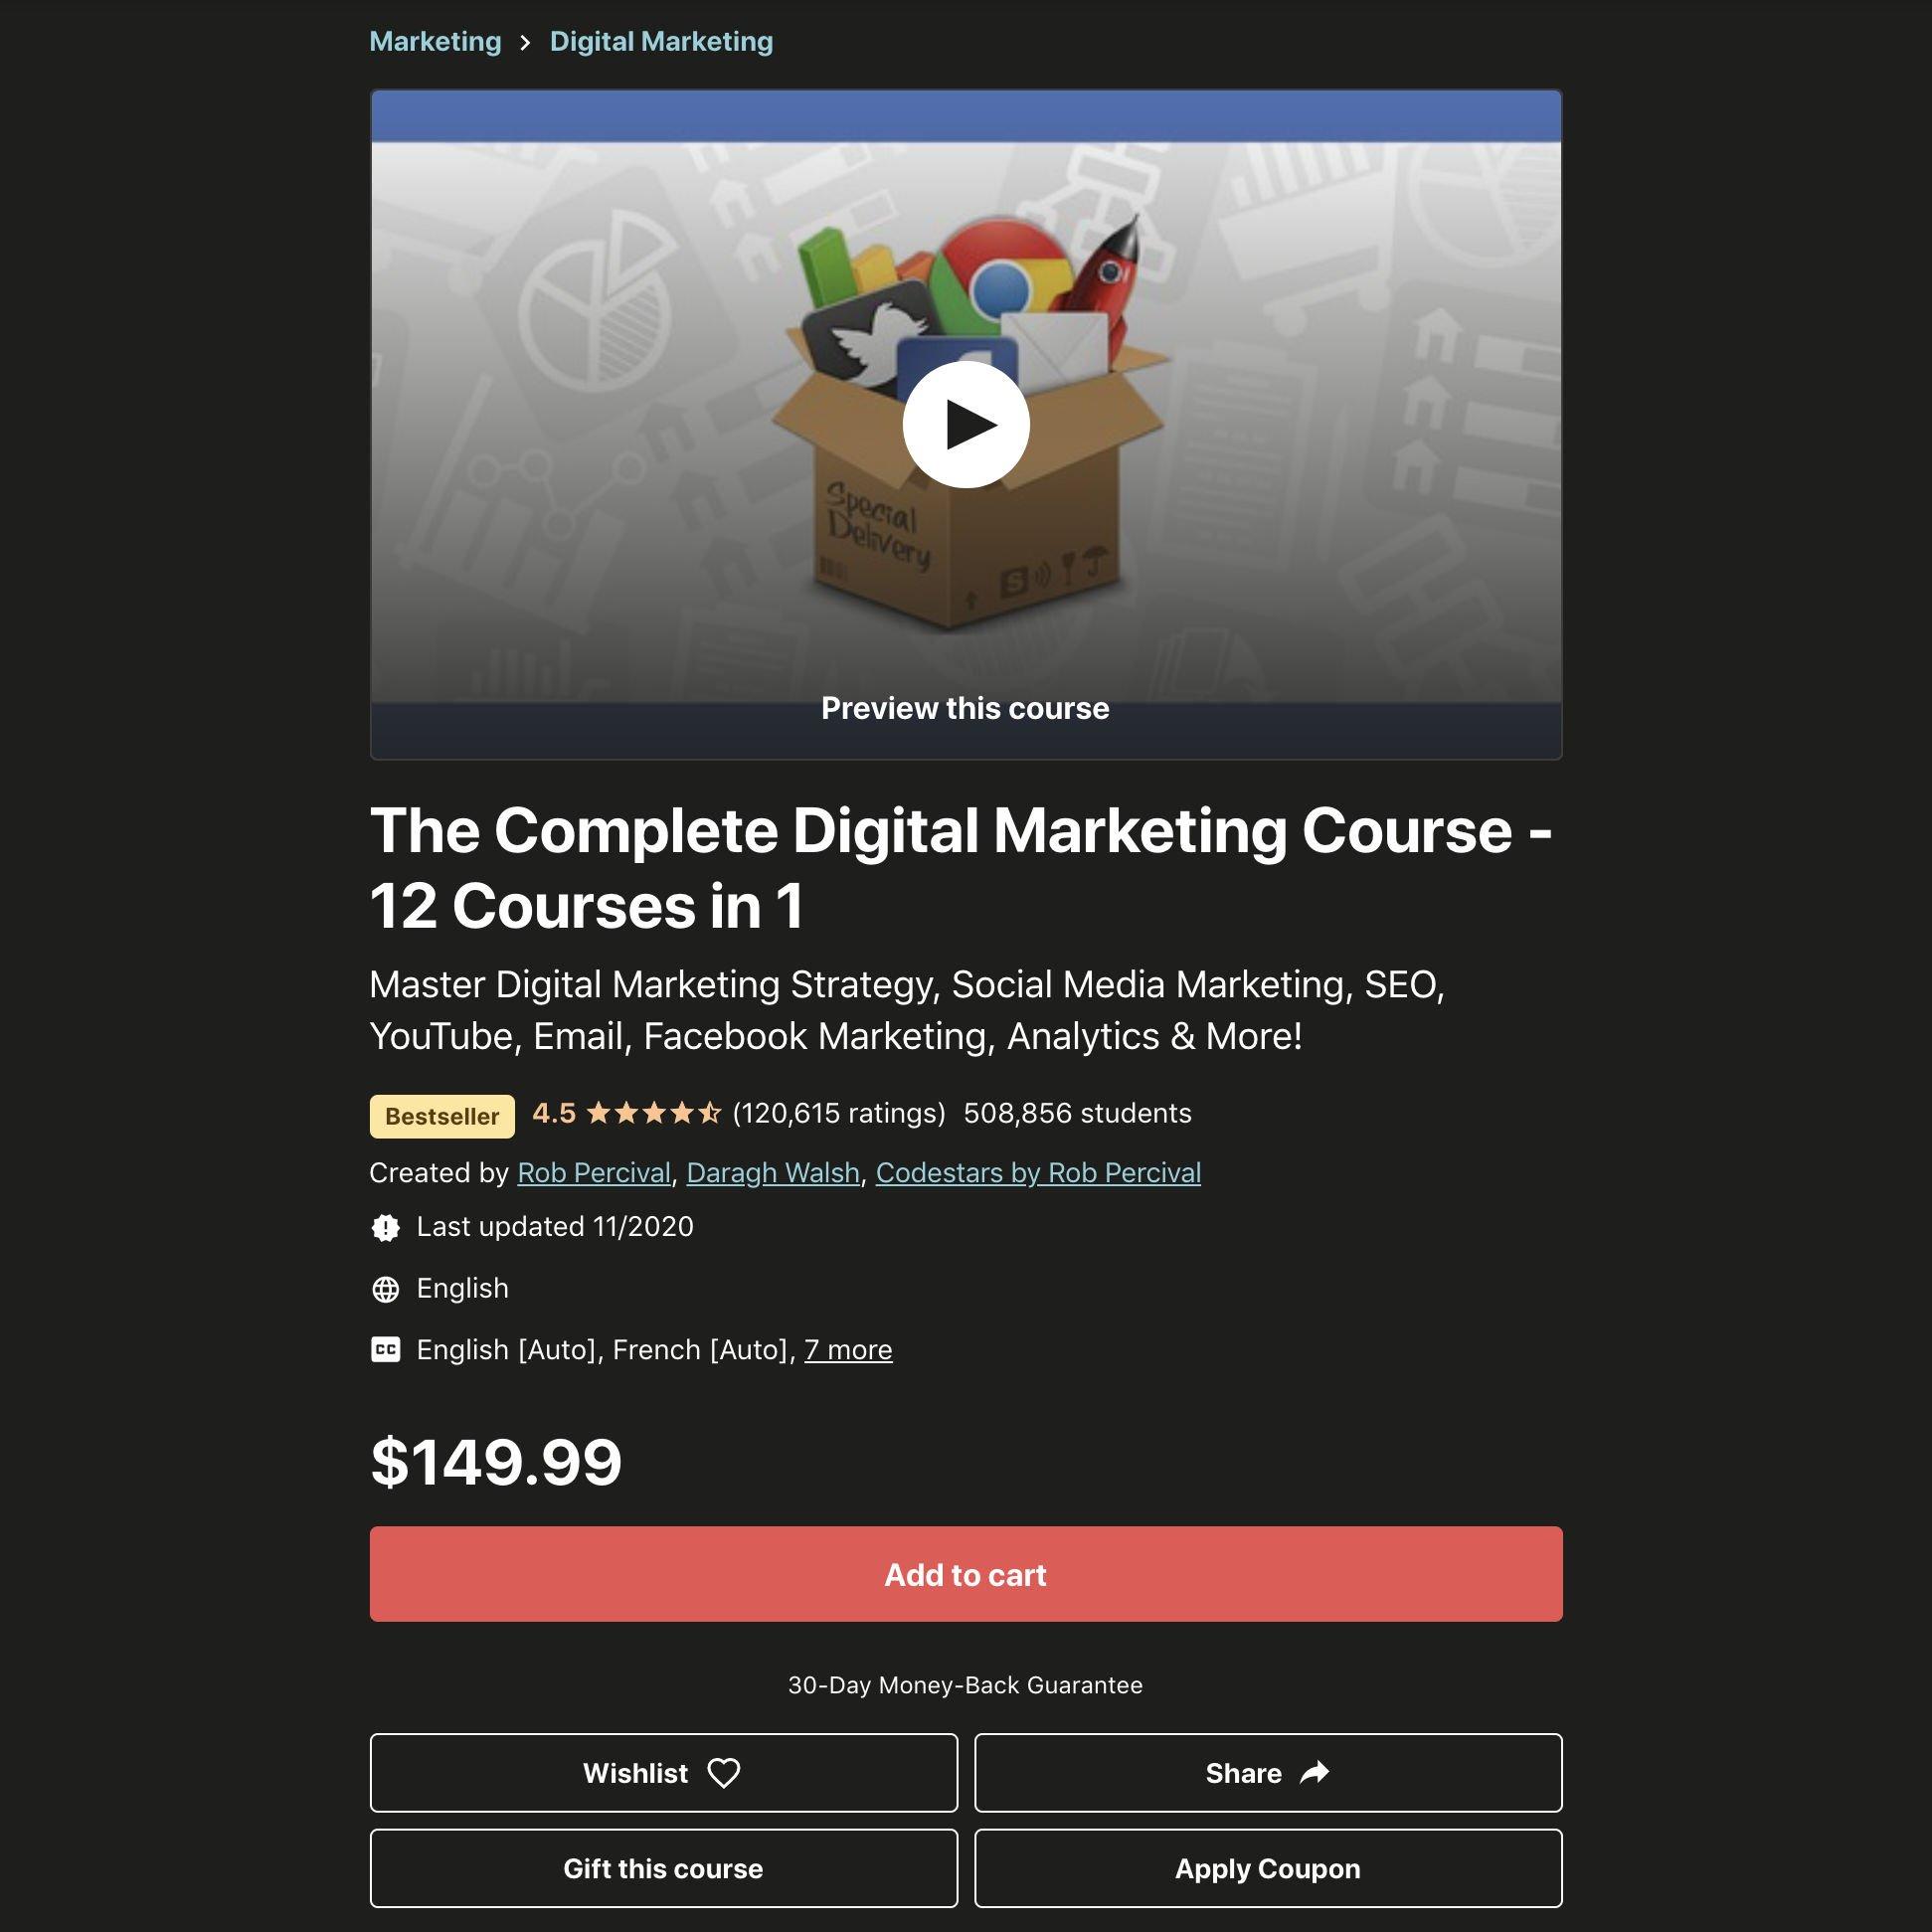 The Complete Digital Marketing Course screenshot.